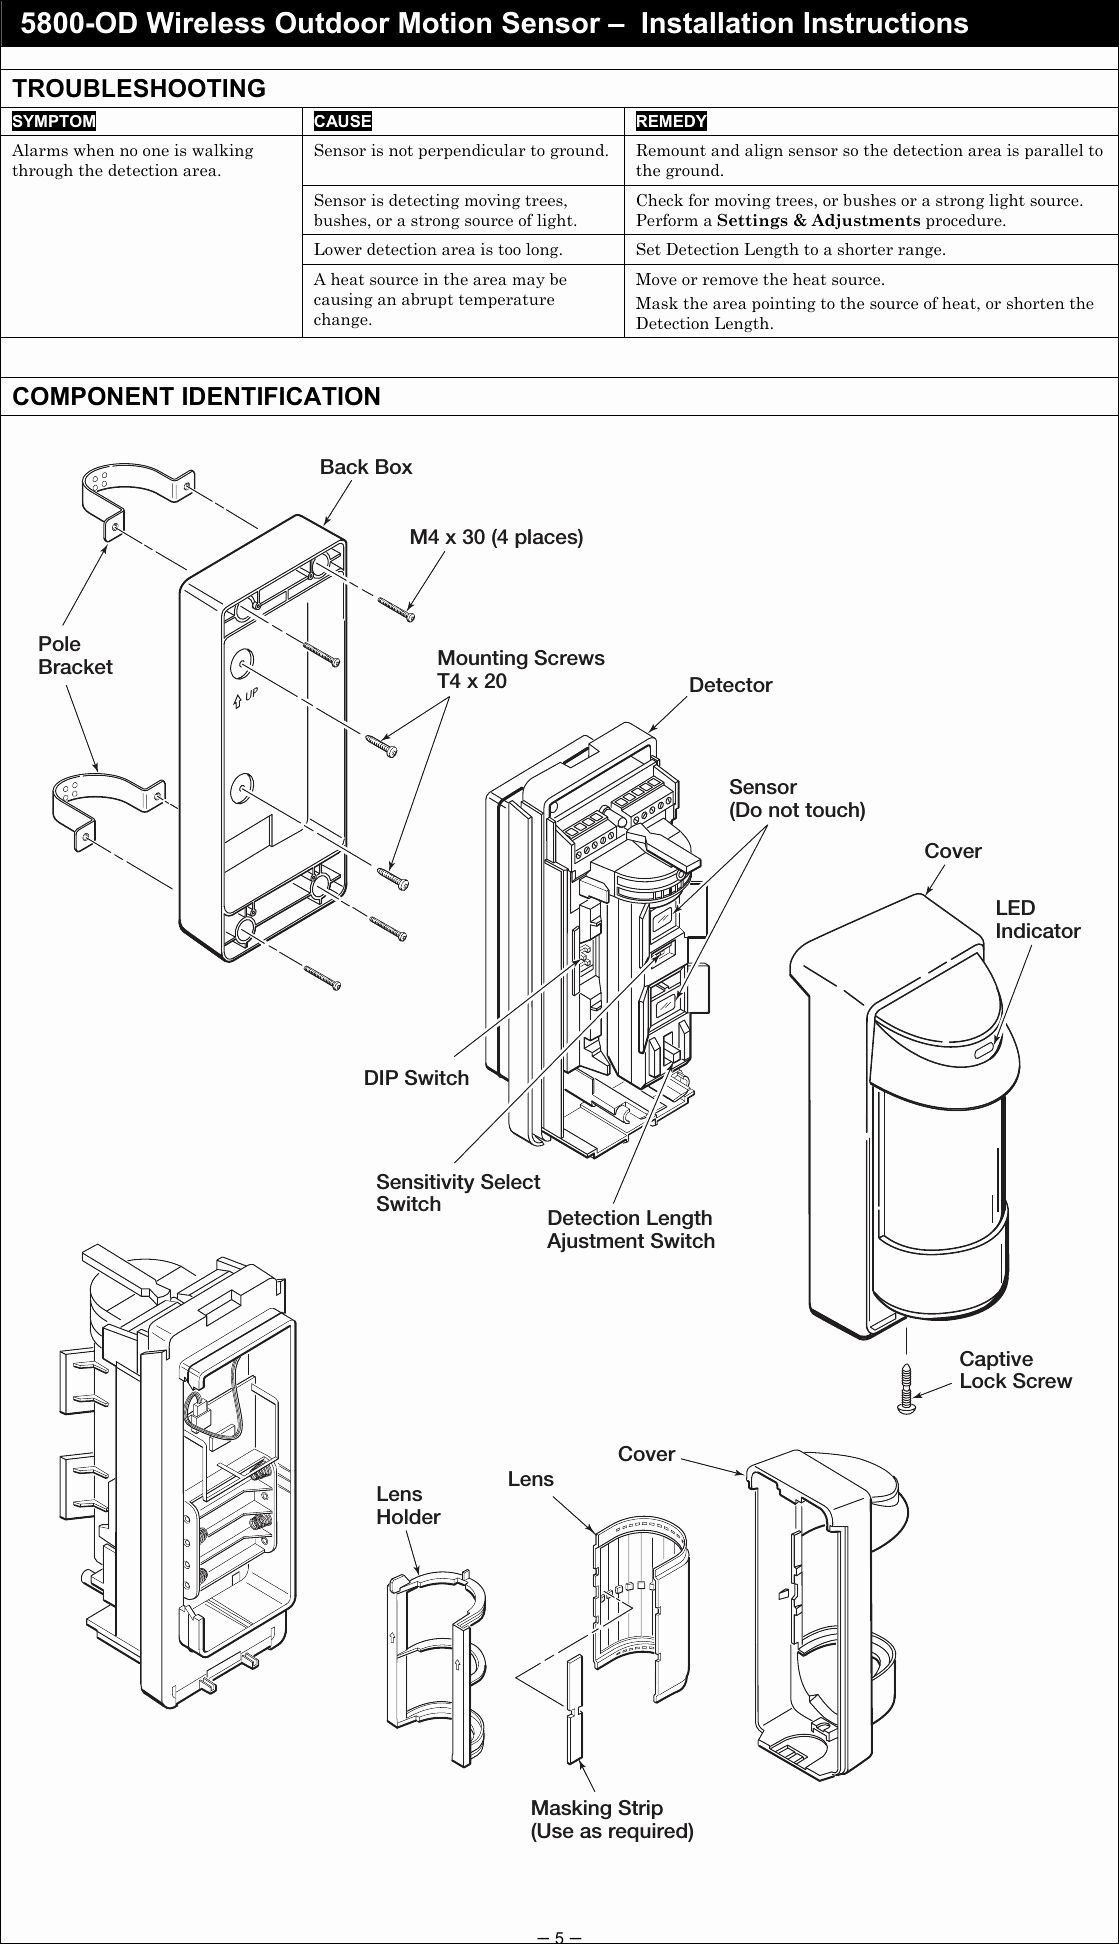 Unique Wiring Diagram for Outdoor Motion Detector Light #diagrams  #digramssample #diagramimages …   Motion sensor lights outdoor, Motion  sensor lights, Flood lightsPinterest